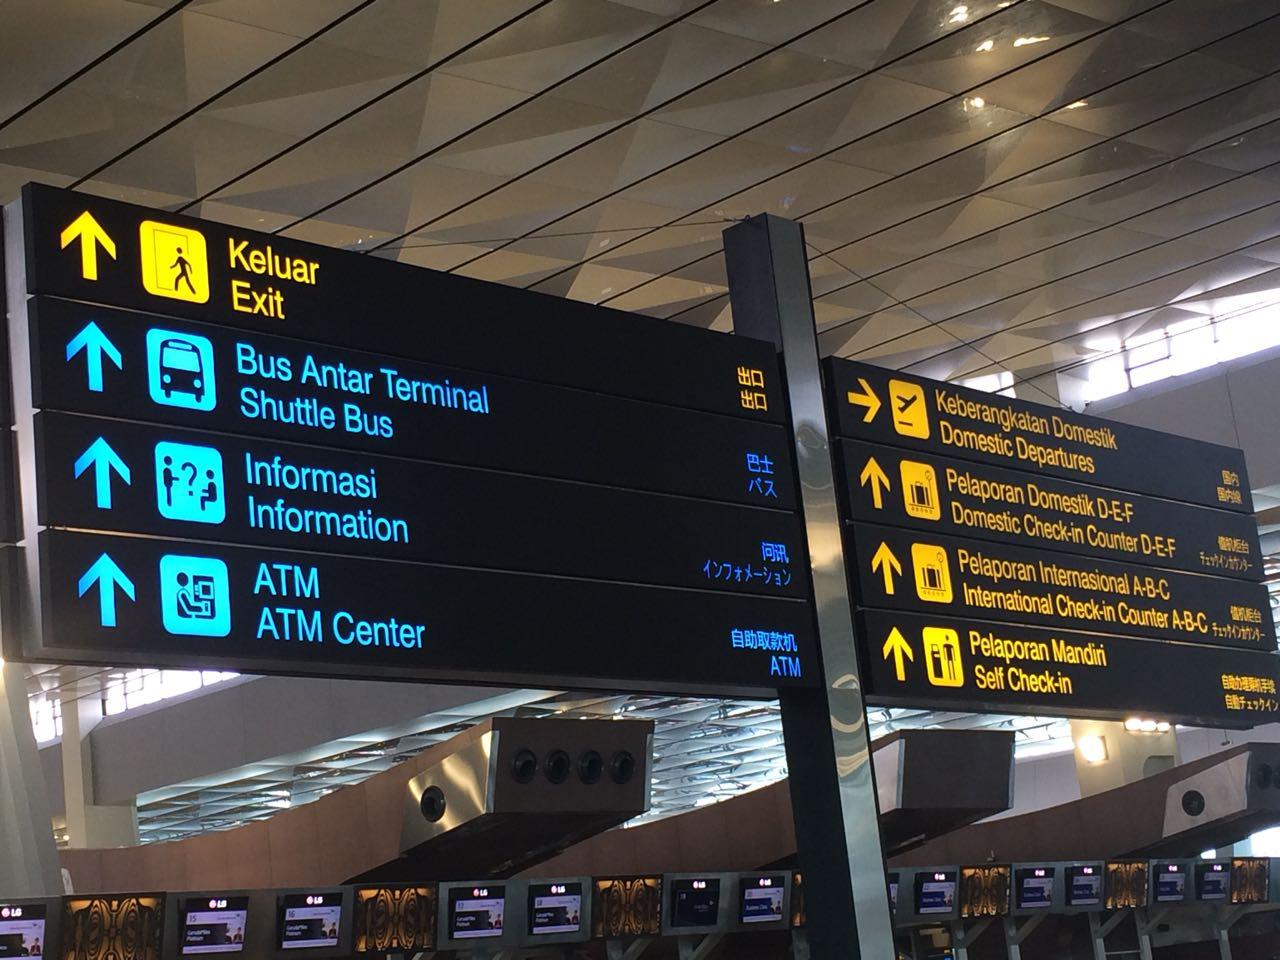 https: img-k.okeinfo.net content 2019 10 04 320 2113055 bandara-baru-yogyakarta-ditargetkan-selesai-akhir-tahun-GPOgXzkxpM.jpg